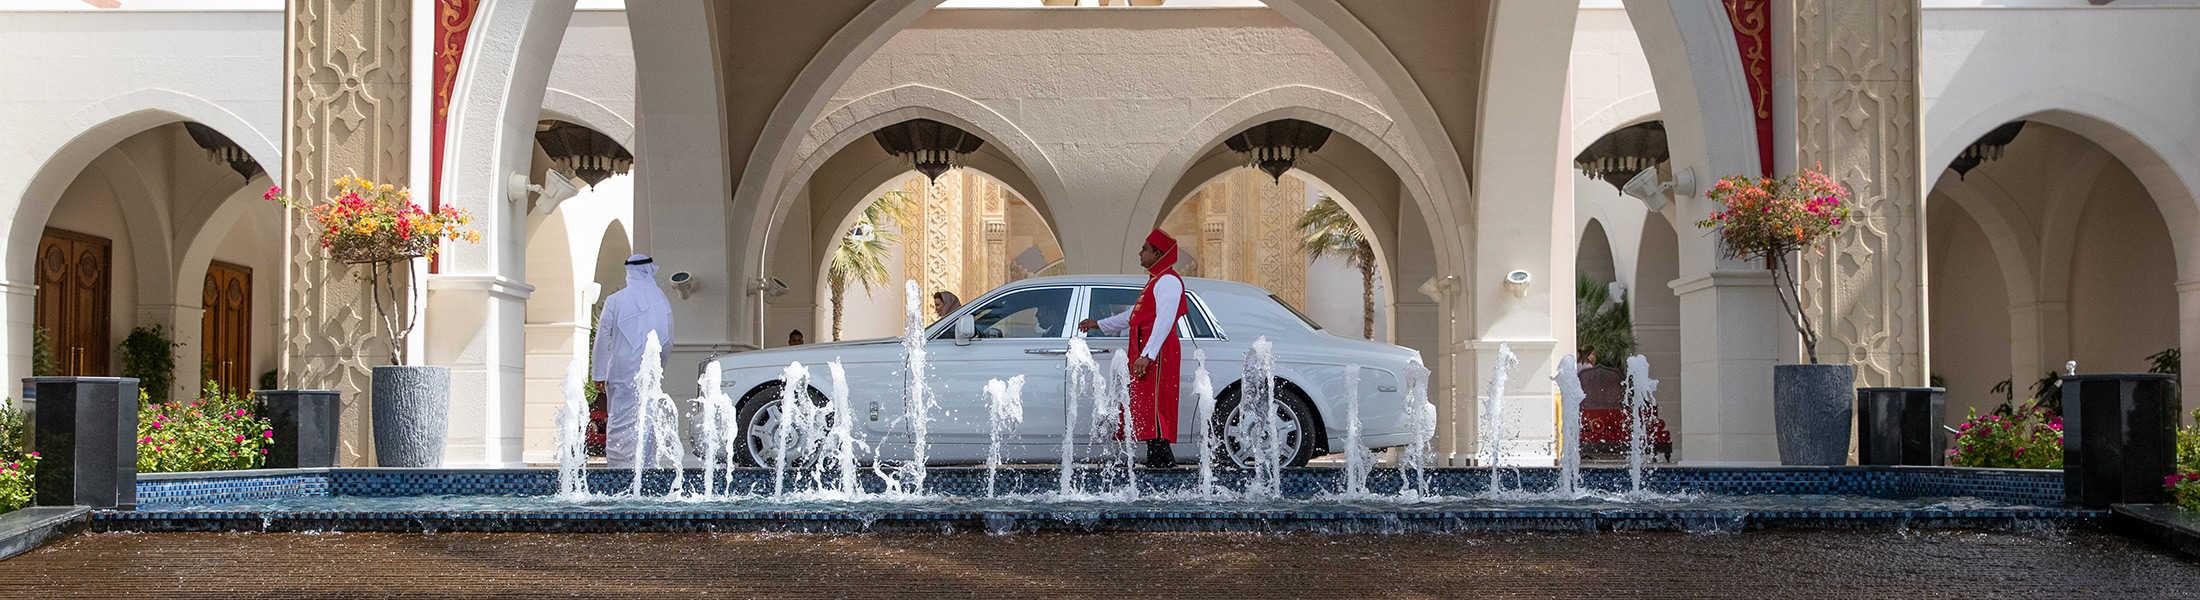 Chaurffeur service at the Jumeirah Zabeel Saray